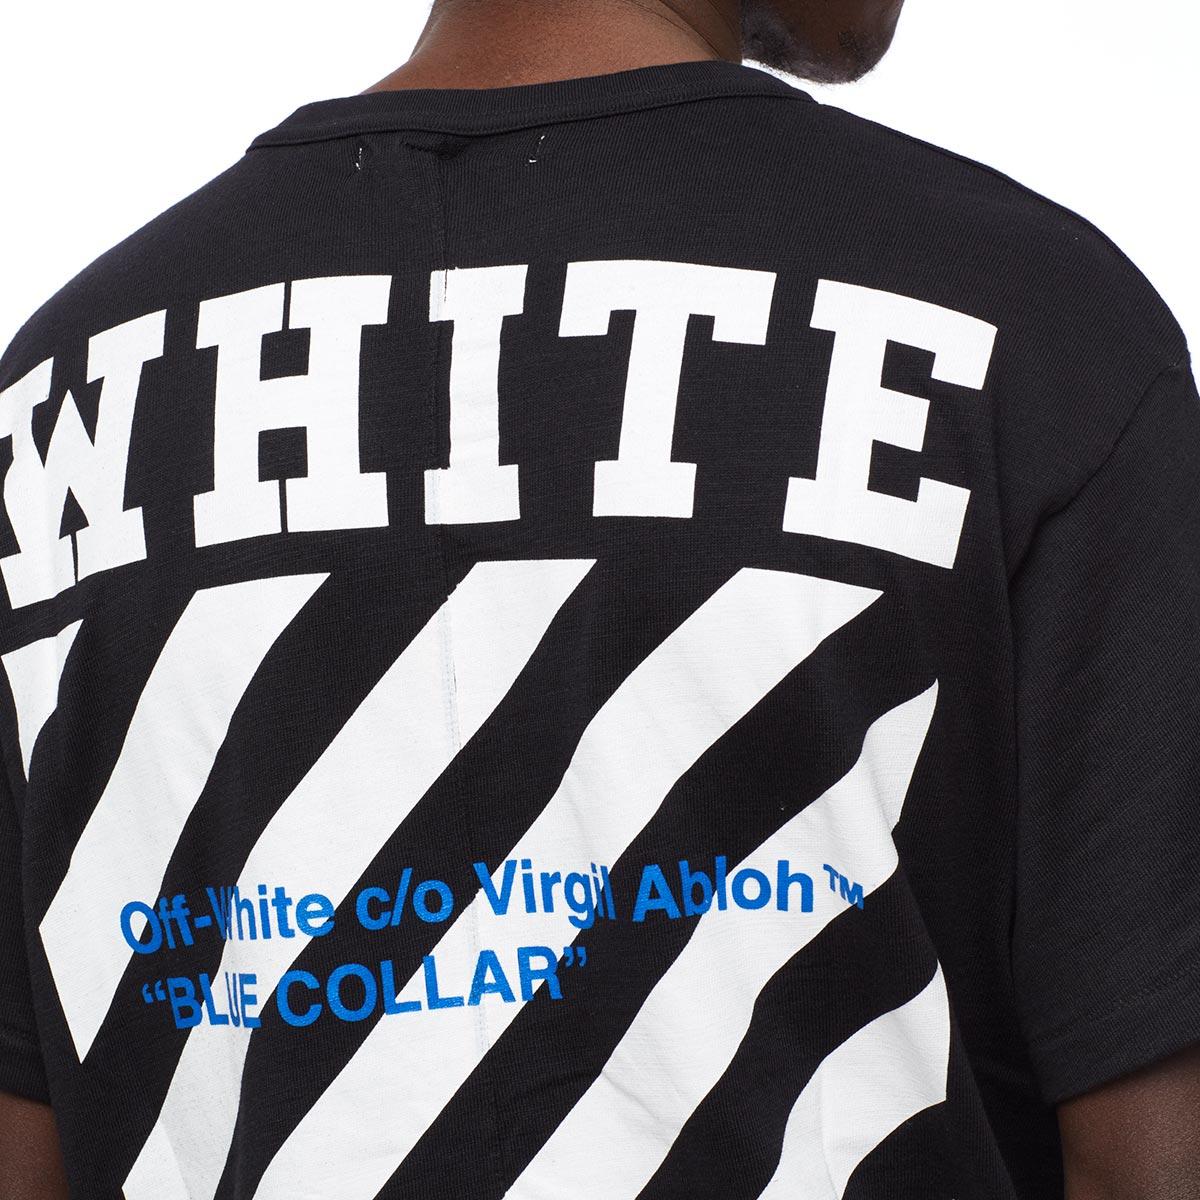 Lyst - Off-White c o Virgil Abloh Blue Collar Cotton T-shirt in ... d03e4ea87